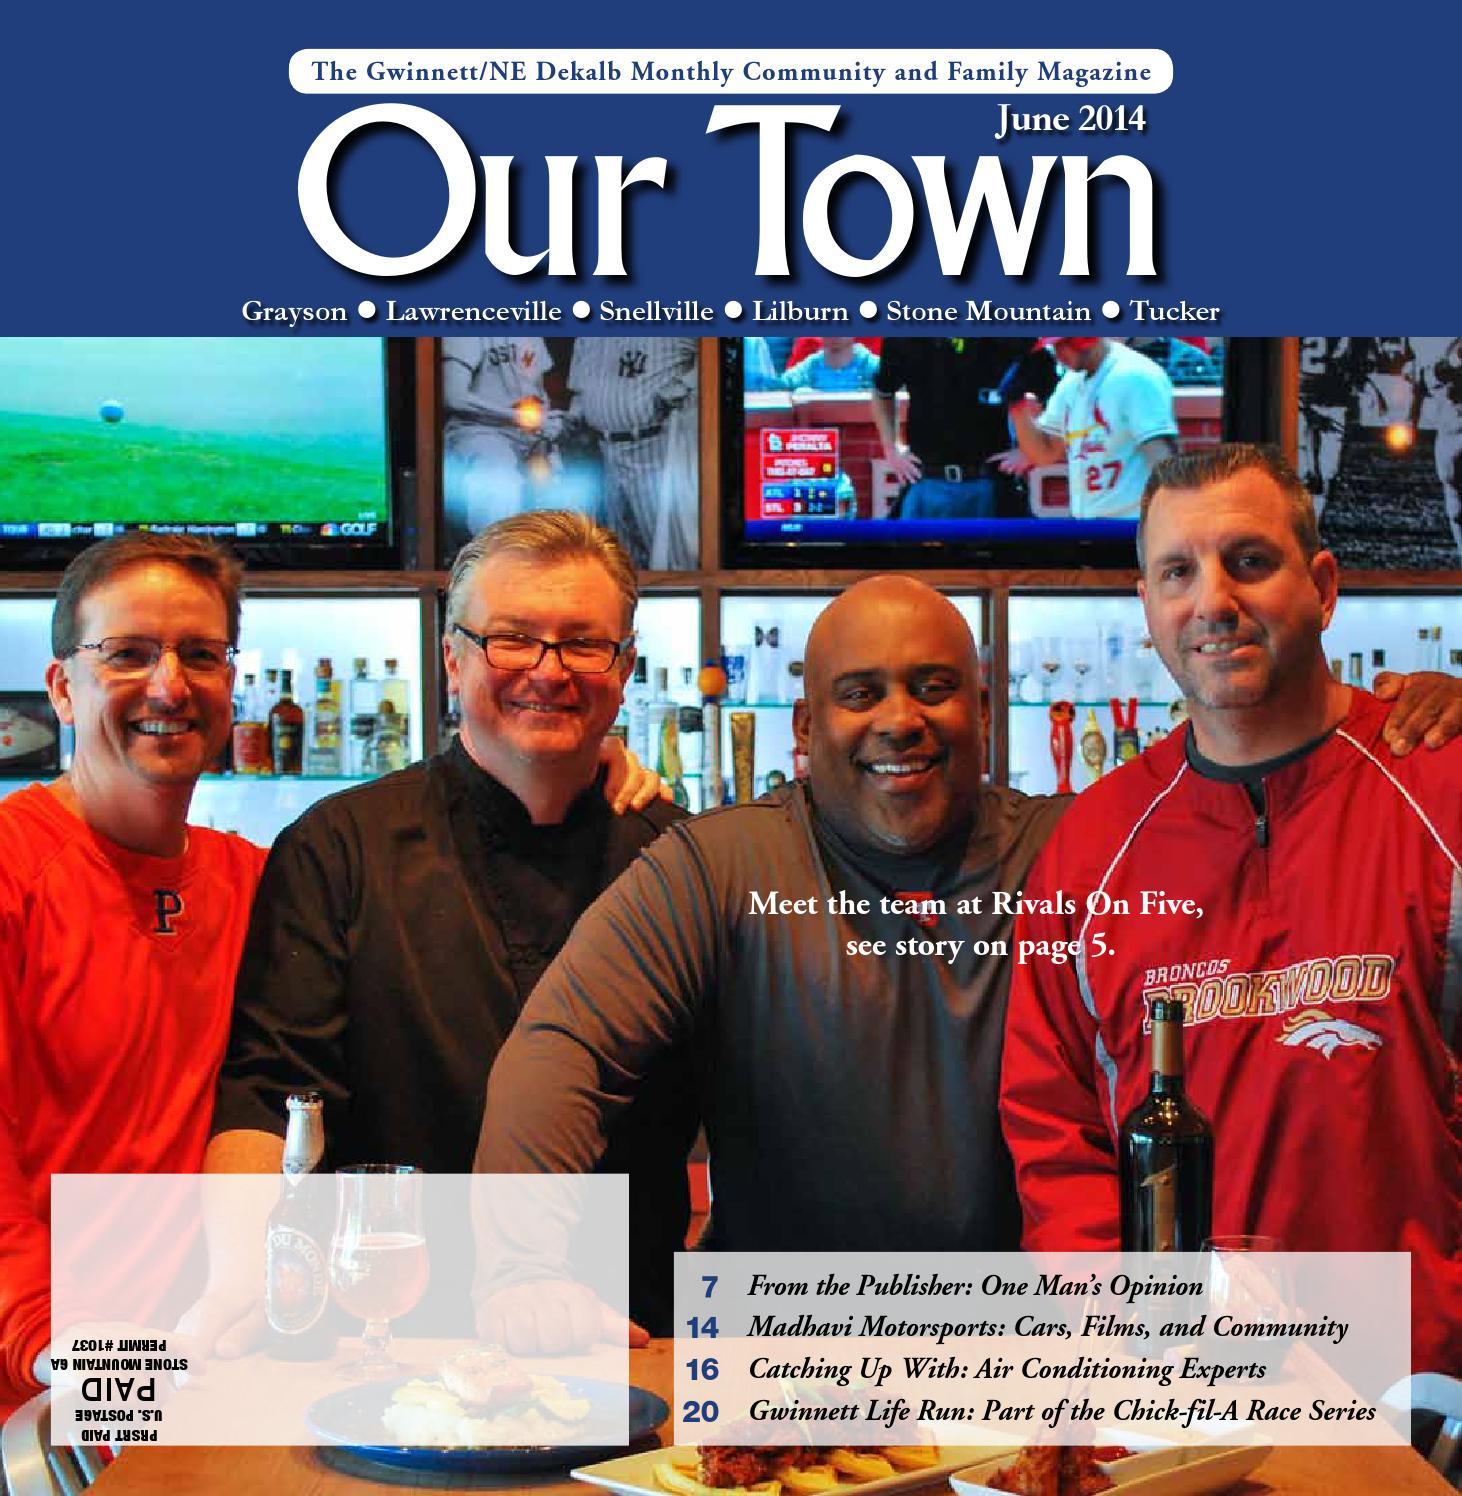 June 2014 Our Town Gwinnett Ne Dekalb Monthly Magazine By